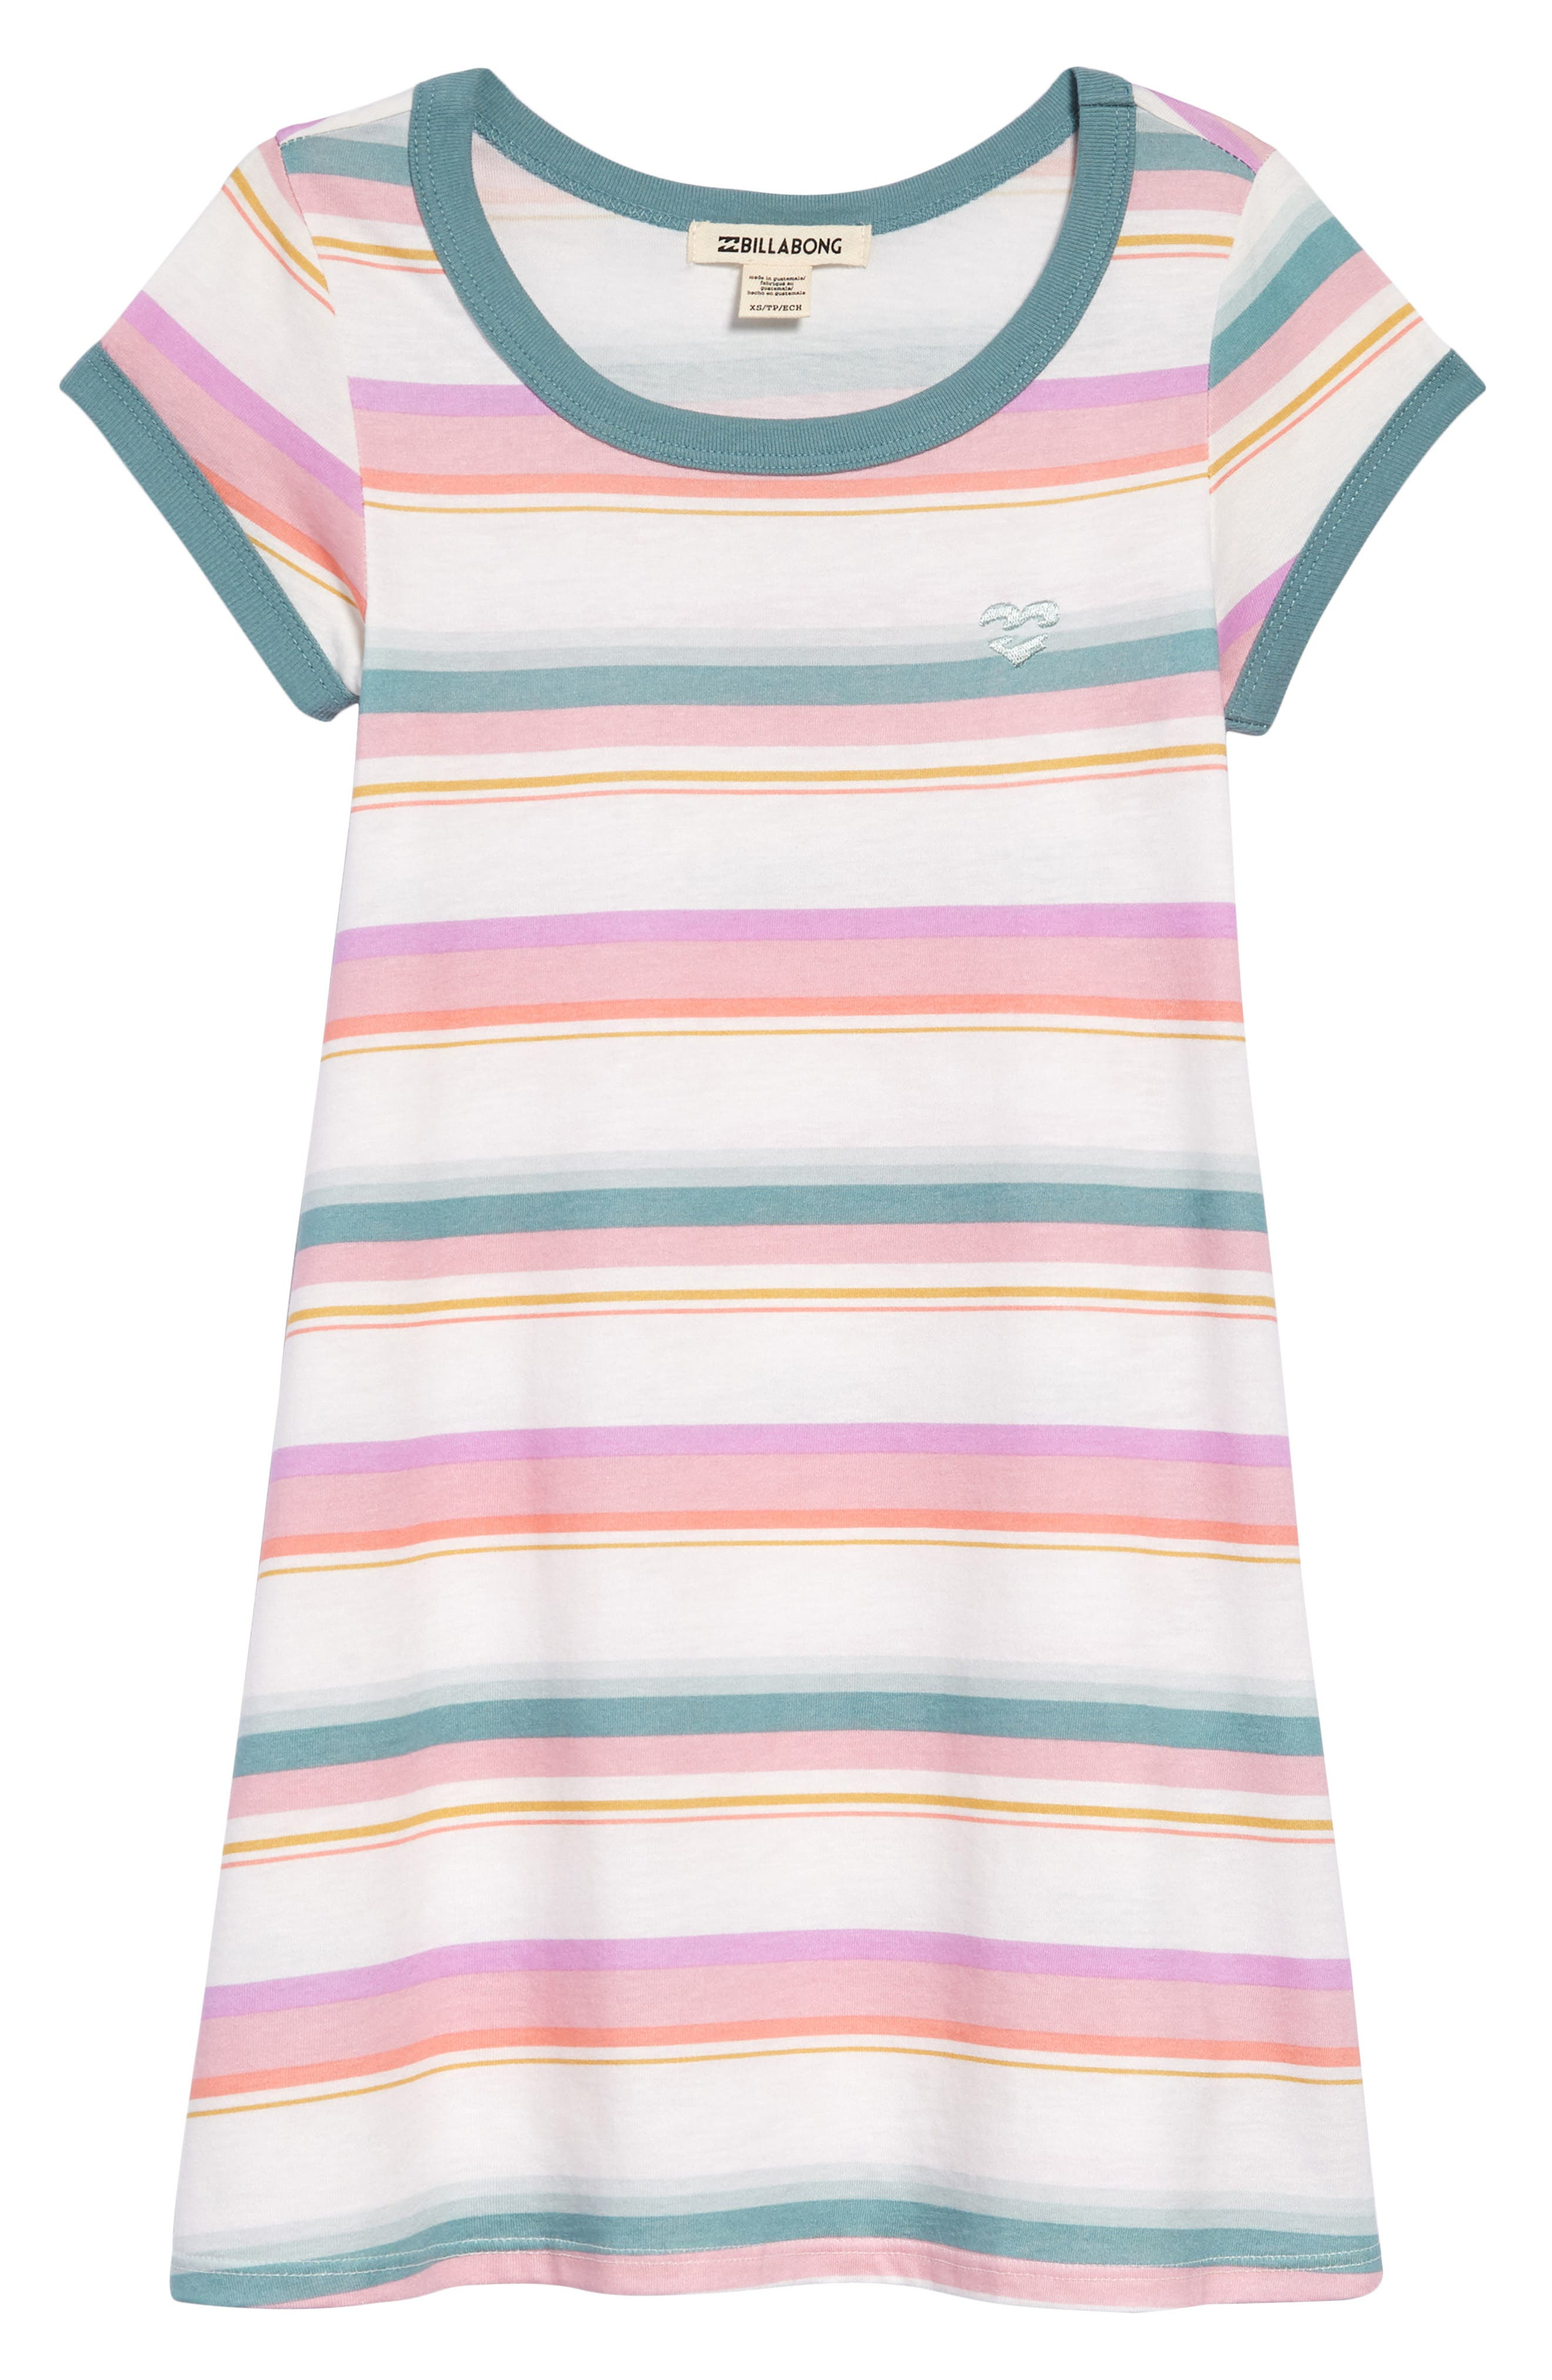 Girls Billabong Play Parade Stripe TShirt Dress Size L (1214)  Green